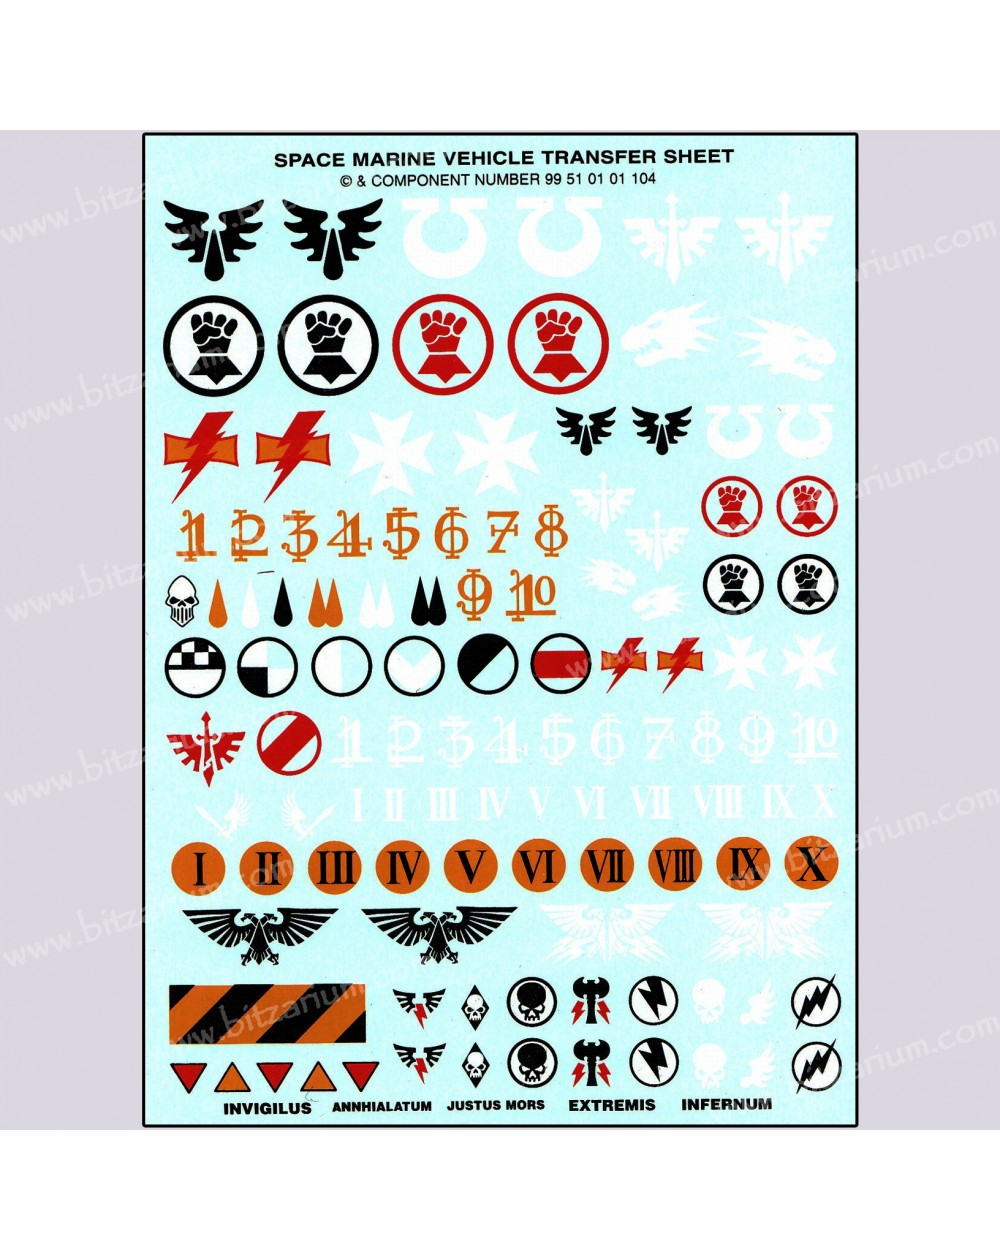 Space Marines Vehicle Transfer Sheet